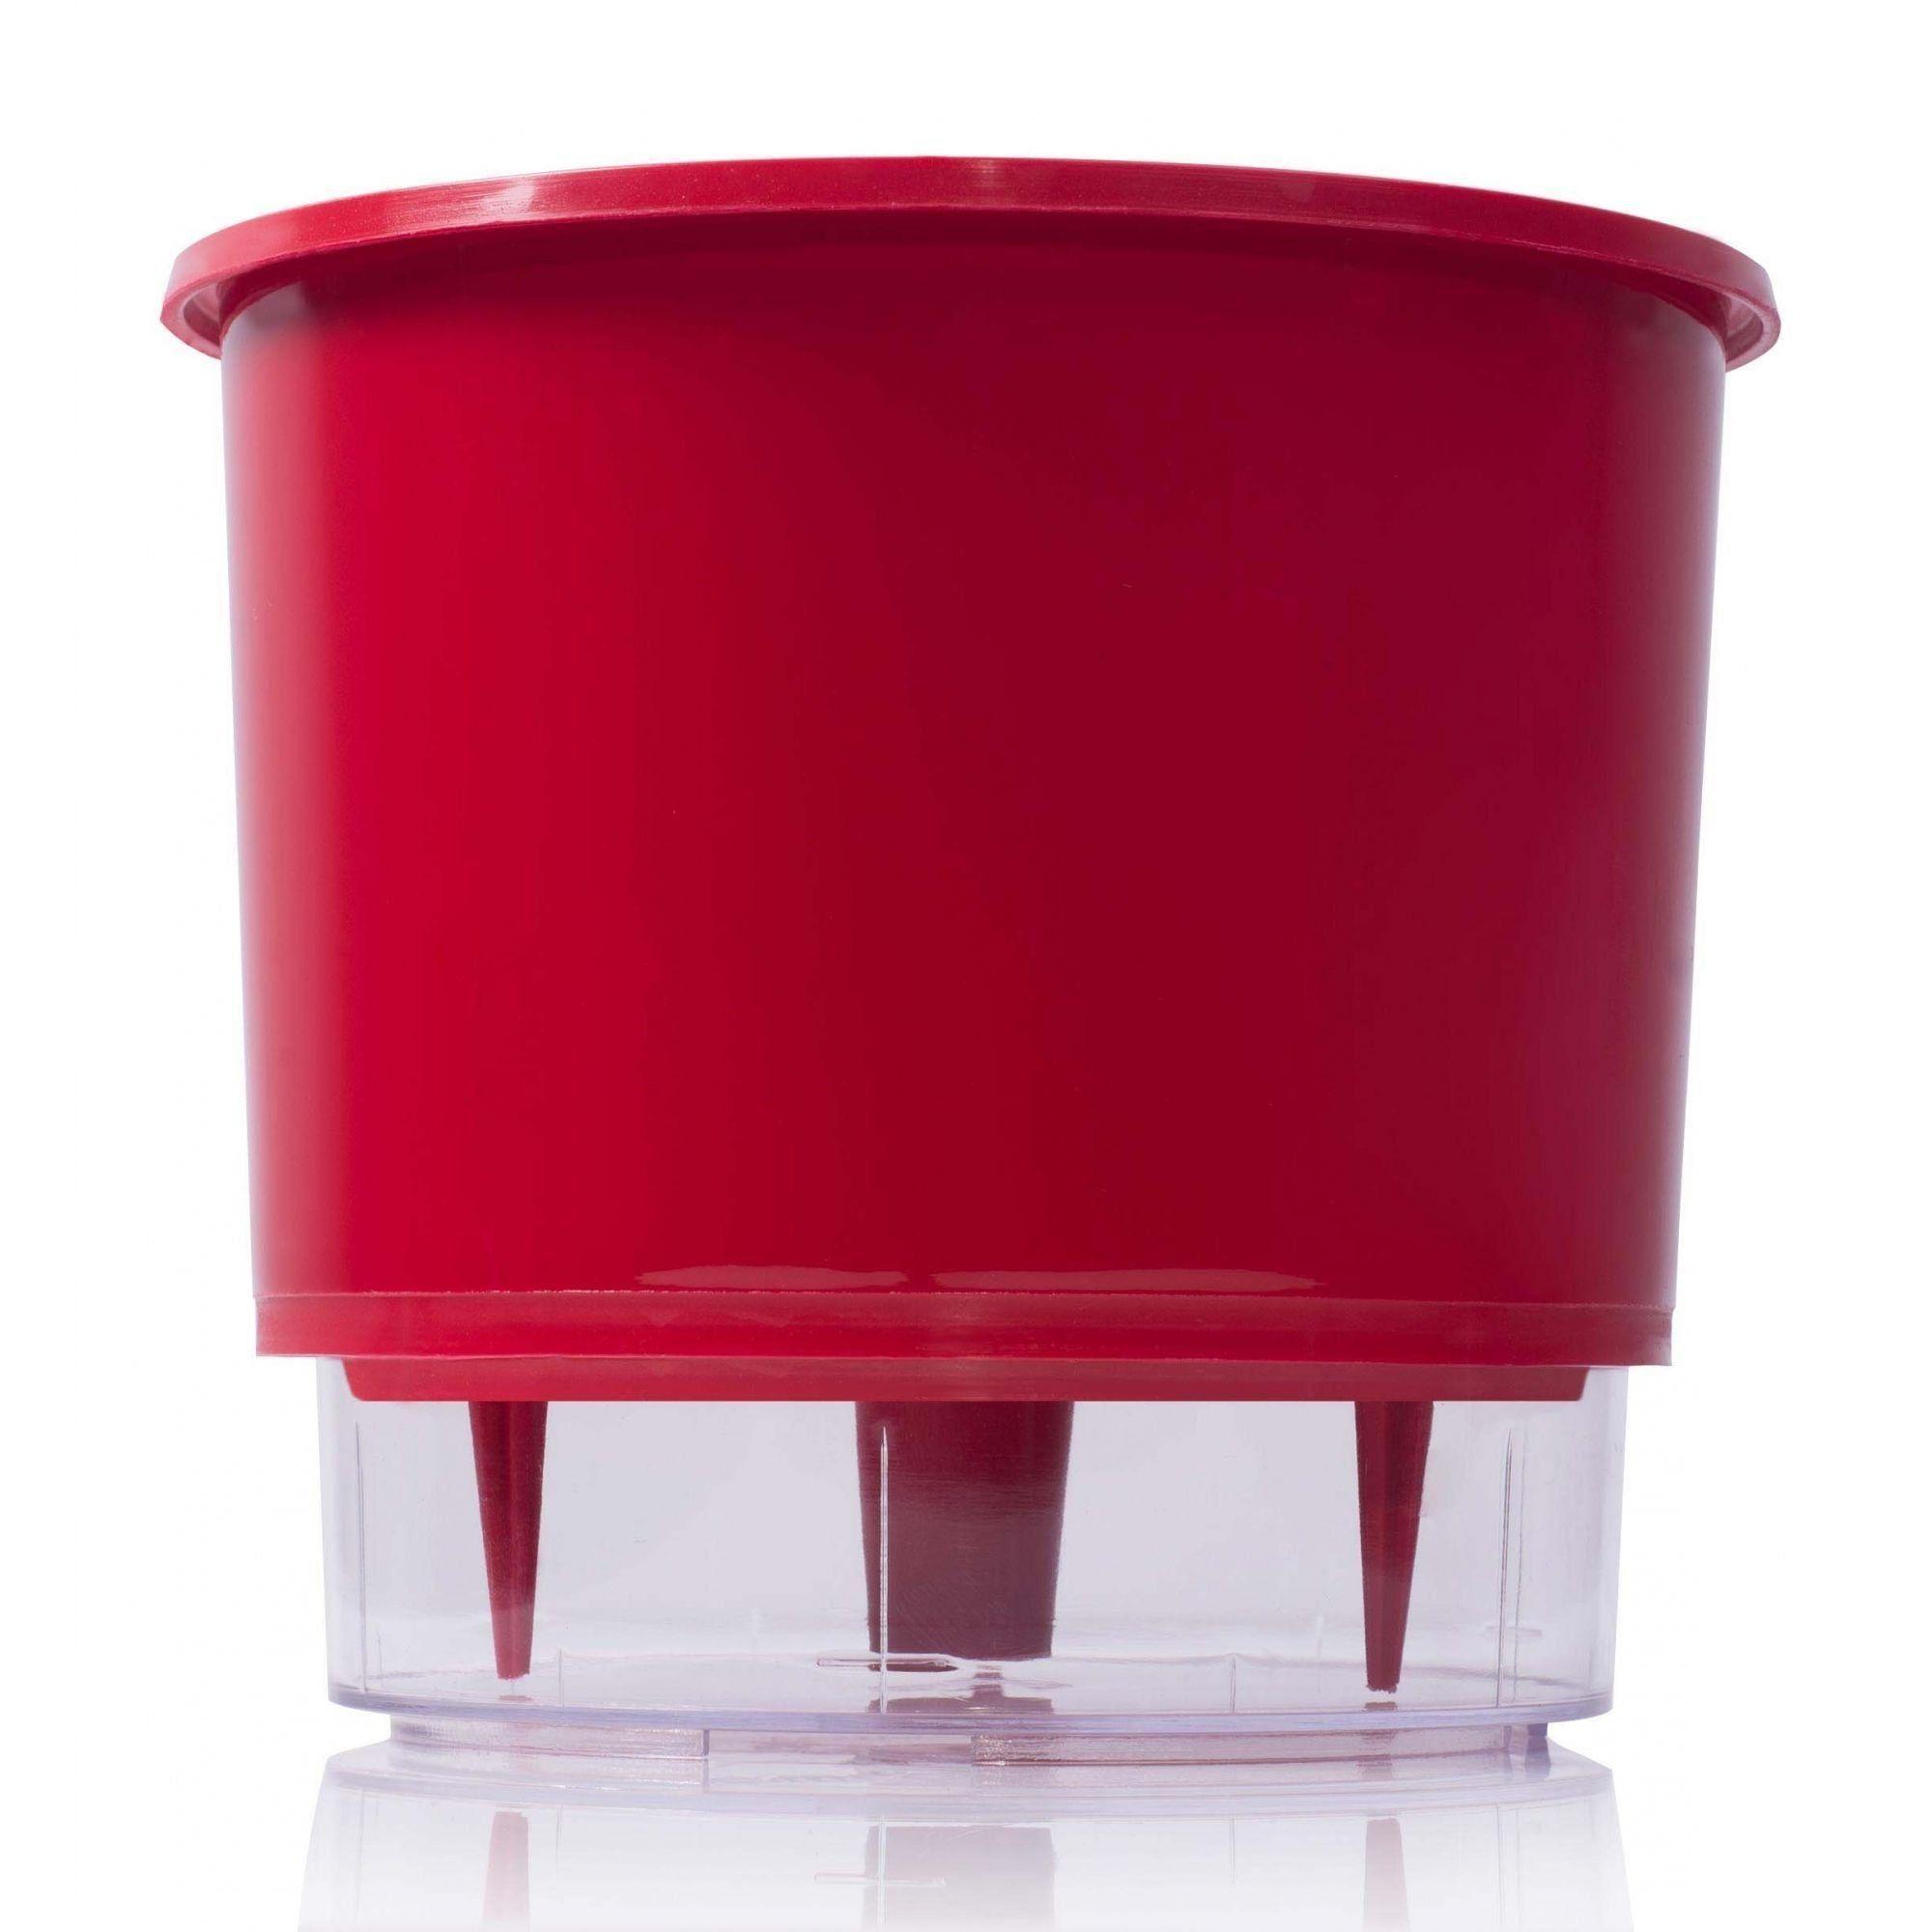 Vaso Autoirrigável 02 Vermelho